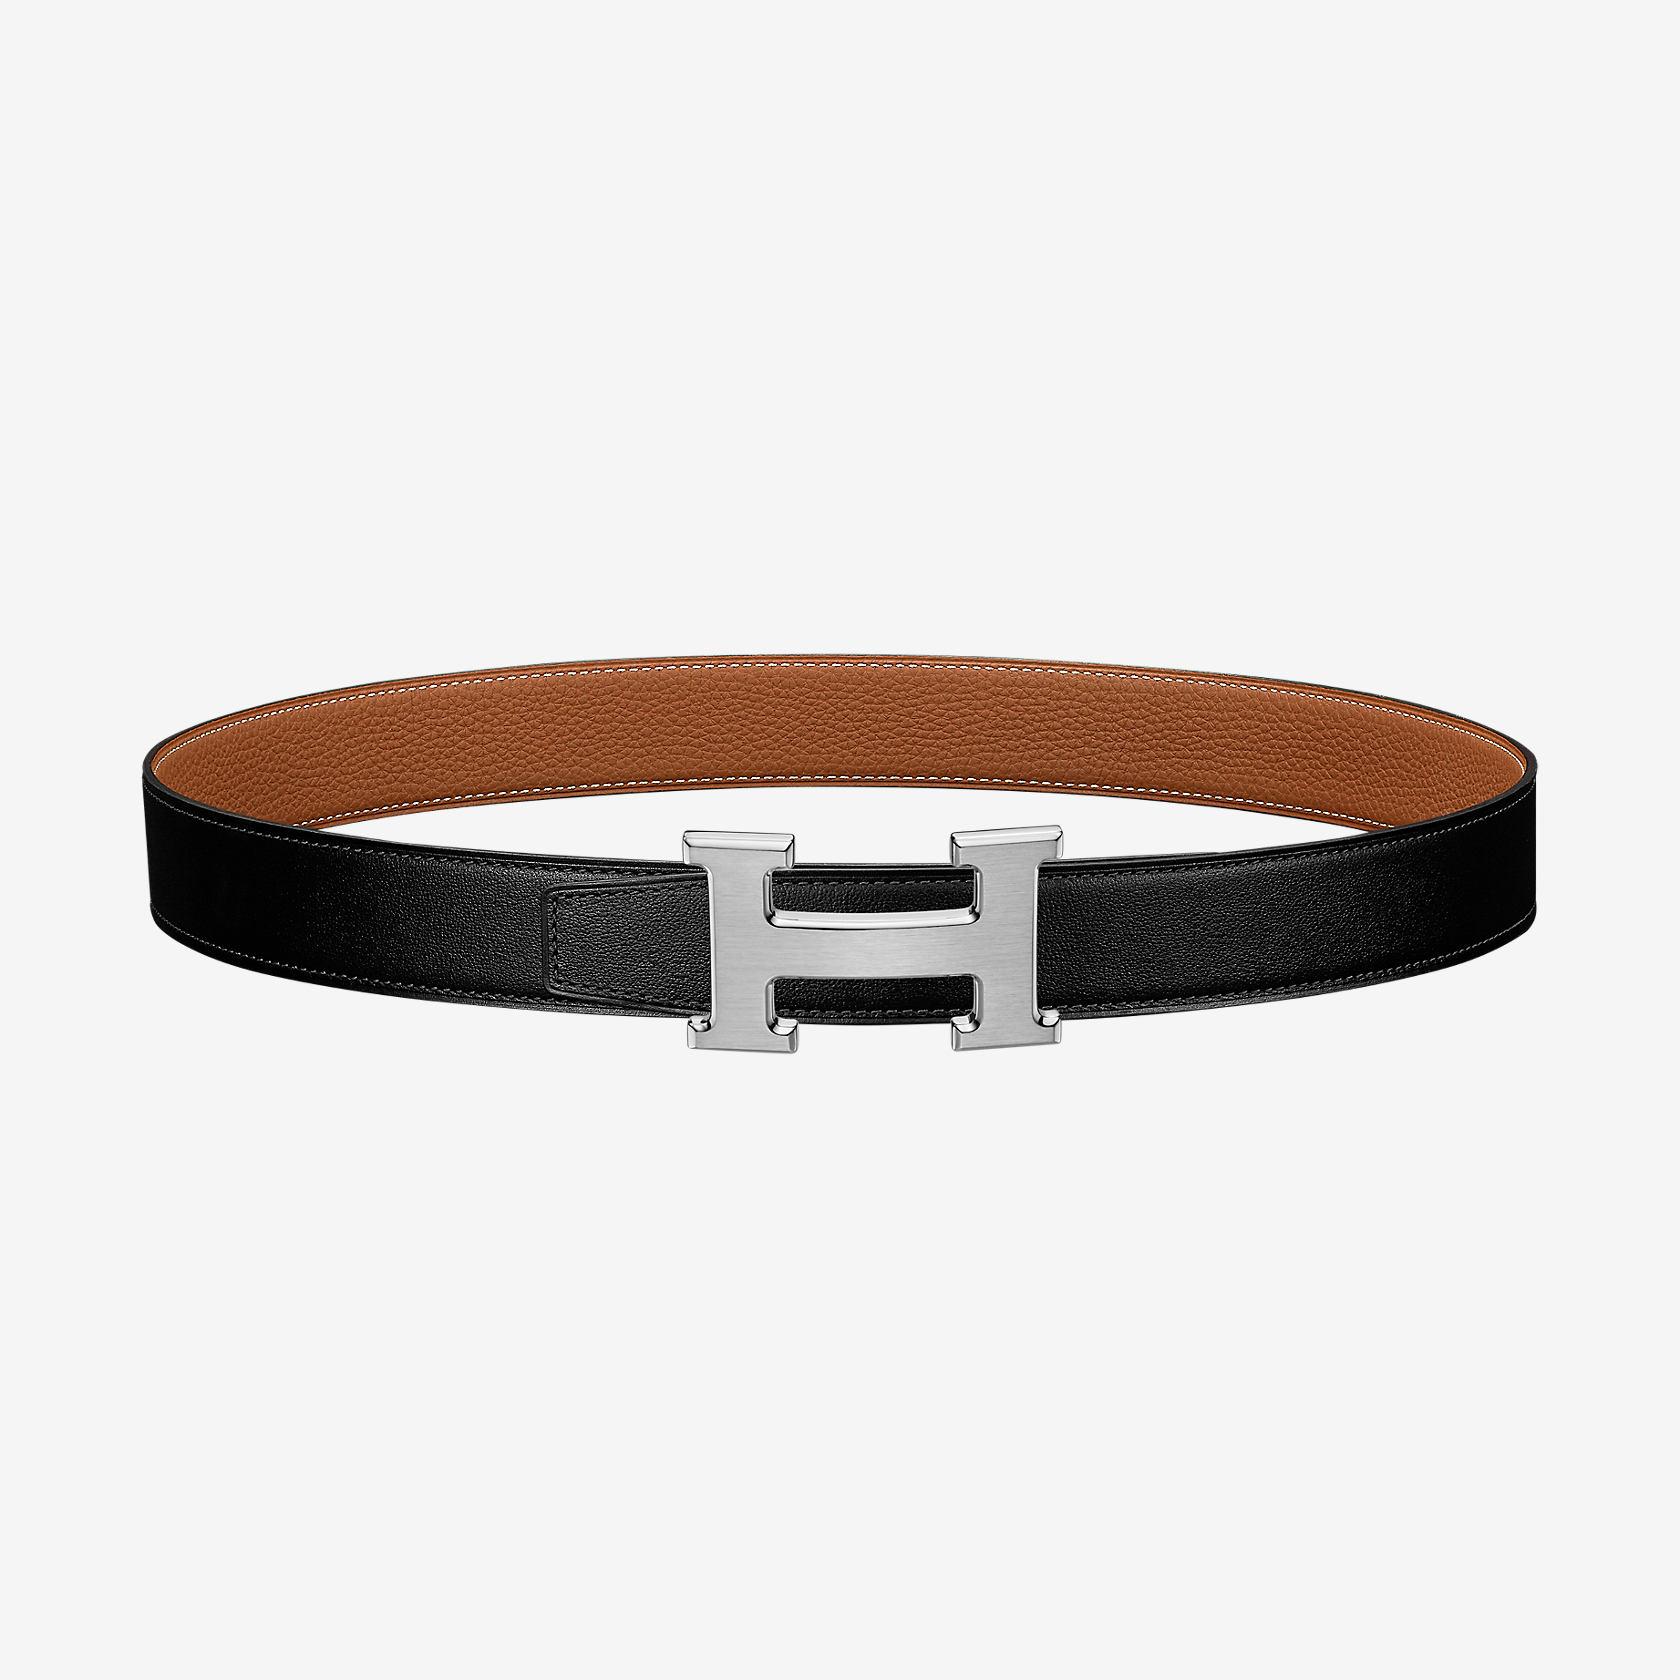 vendita scontata offerta speciale grandi affari 2017 Fibbia da cintura H & Pelle reversibile per cintura 32 mm